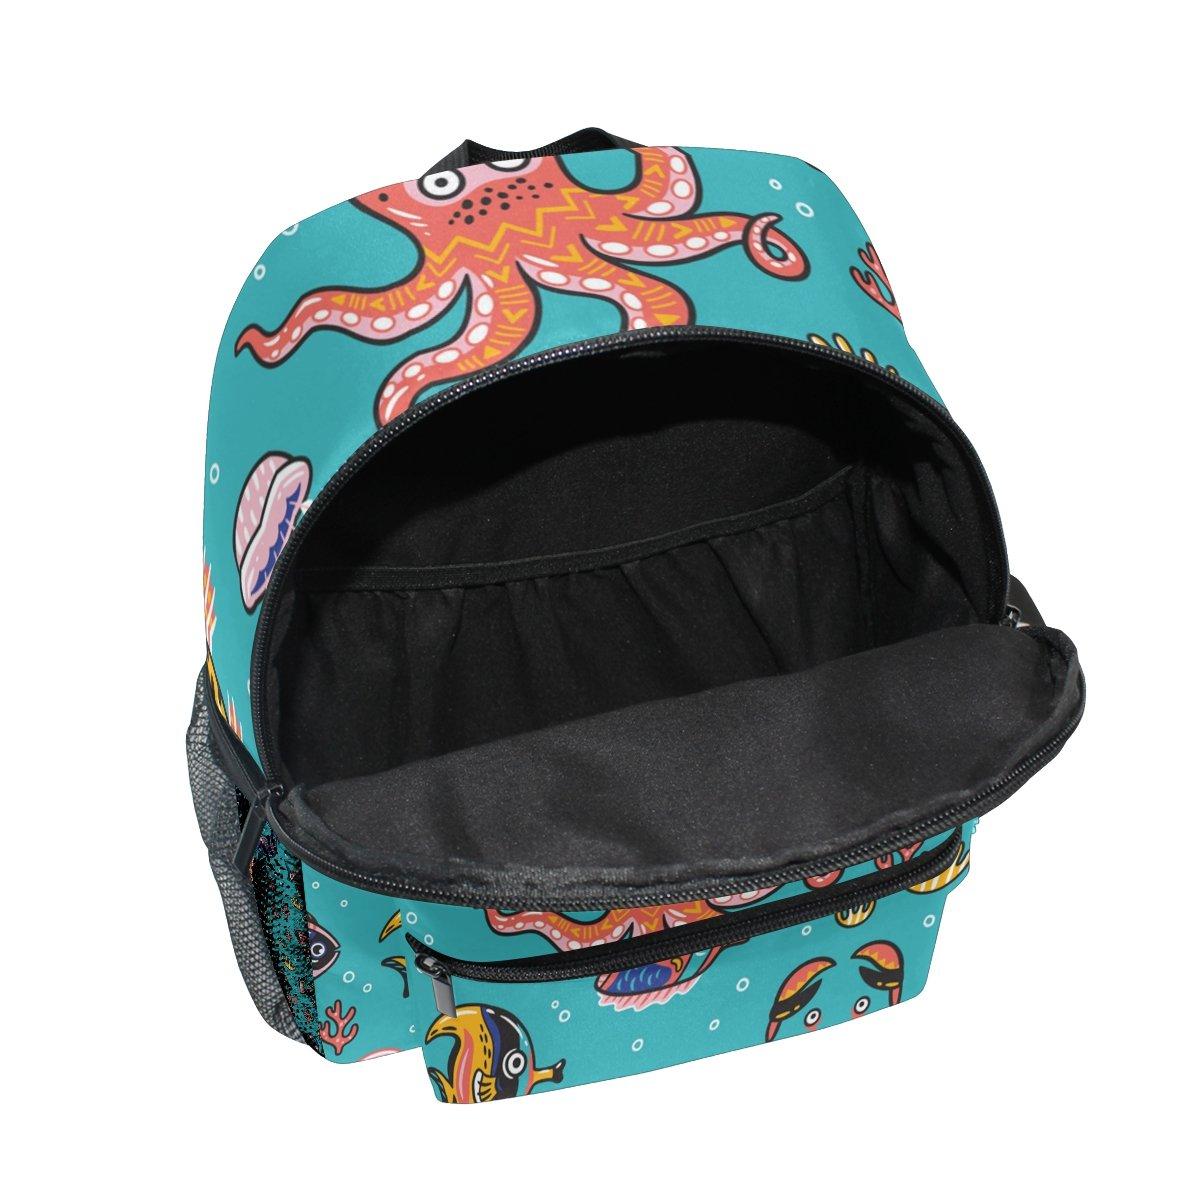 489f89da9222 MyDaily Kids Backpack Octopus Seal Narwhal Fish Cartoon Nursery Bags for  Preschool Children  Amazon.co.uk  Luggage